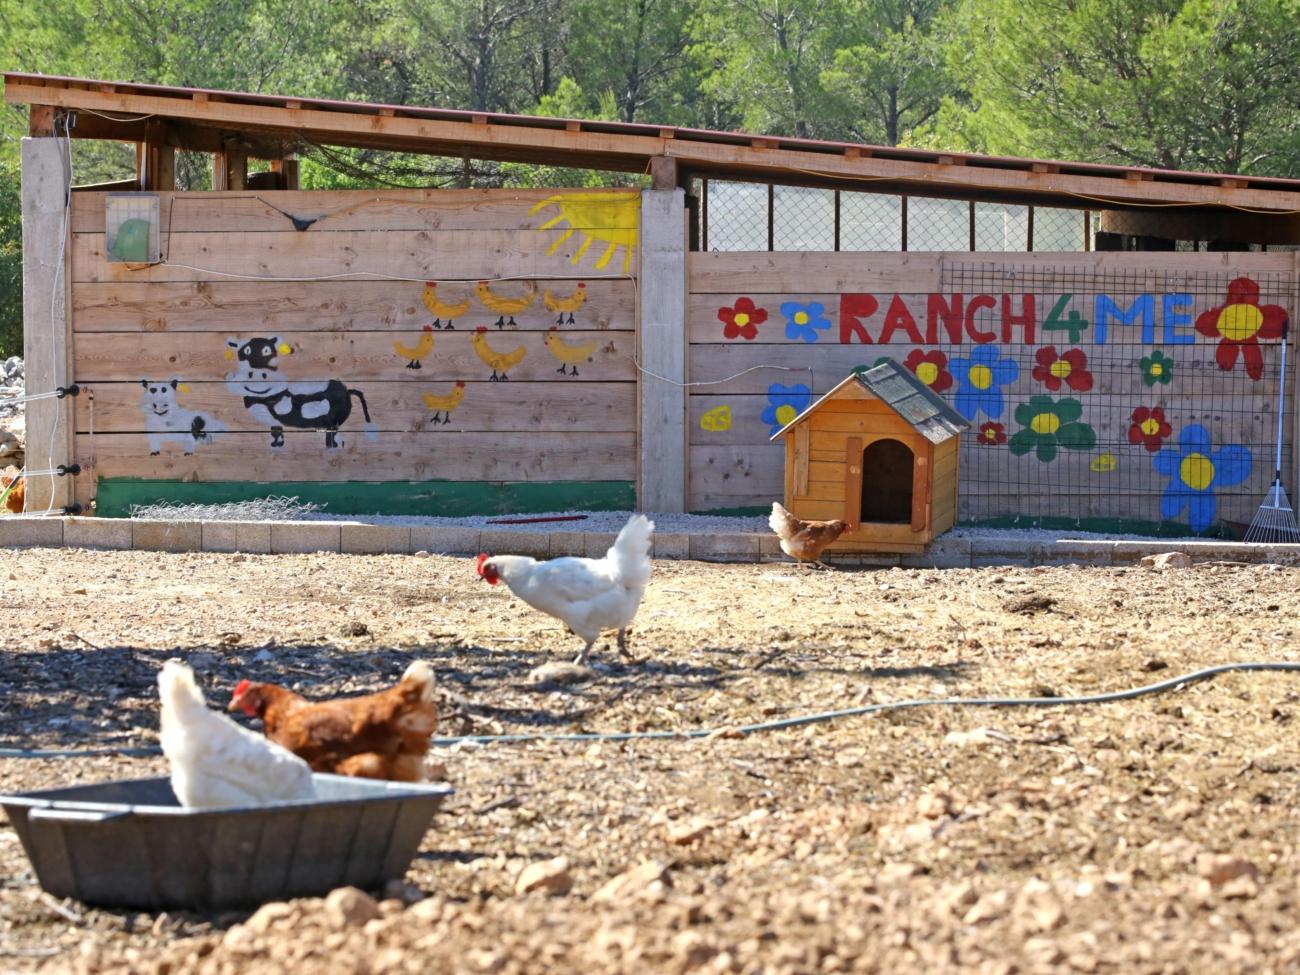 opg ranch 4 Me 230921 20